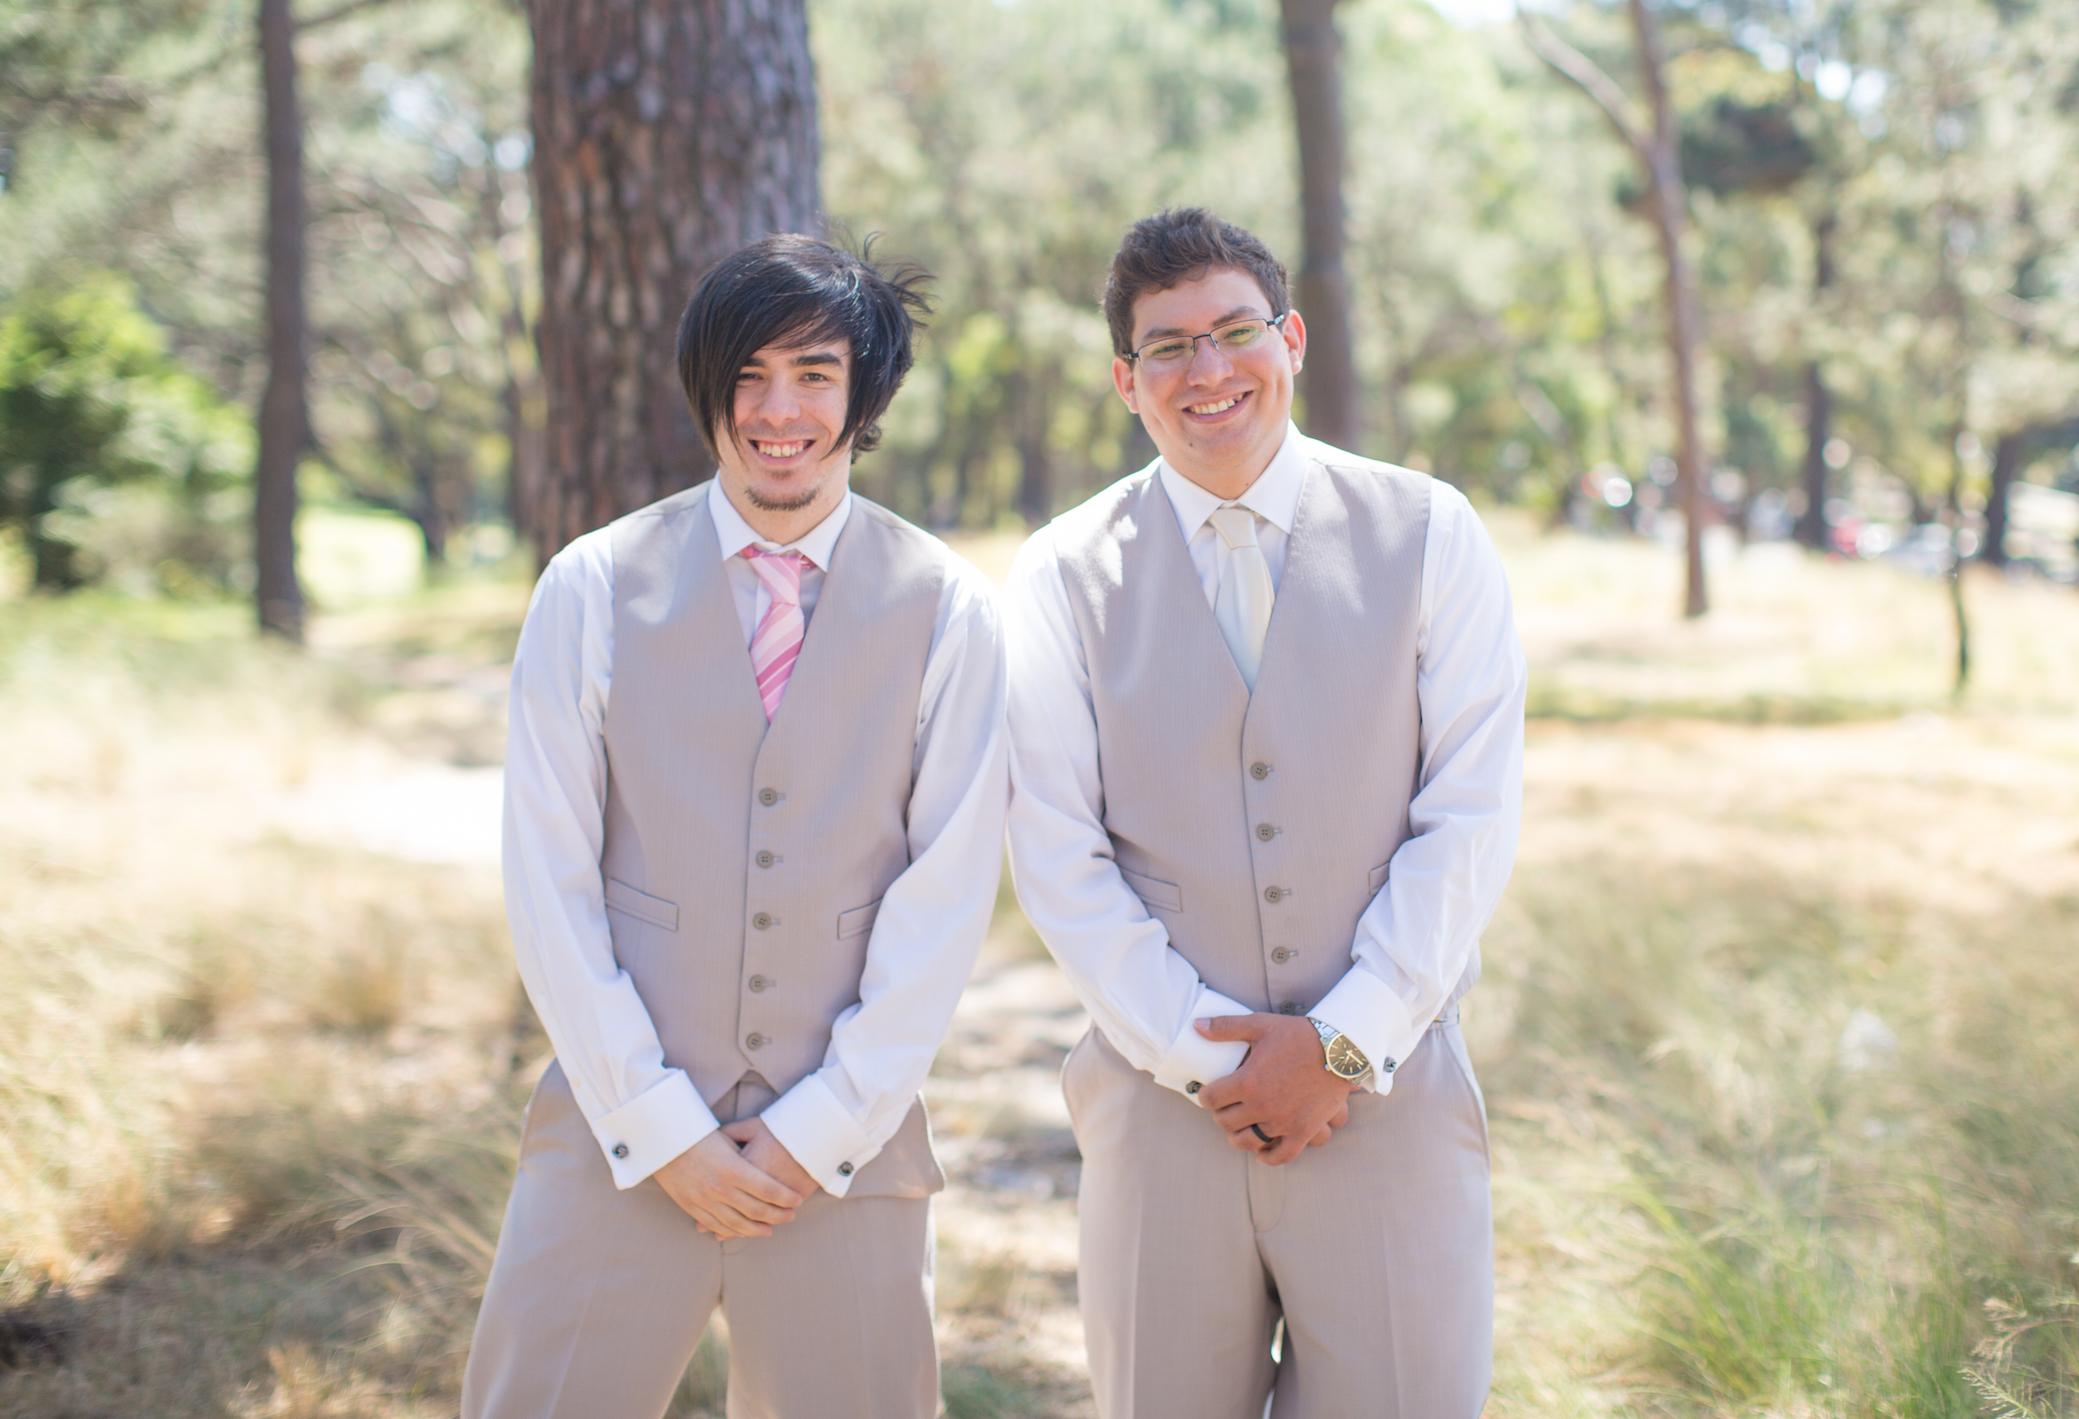 Groomsmen Suit Ideas DIY Wedding